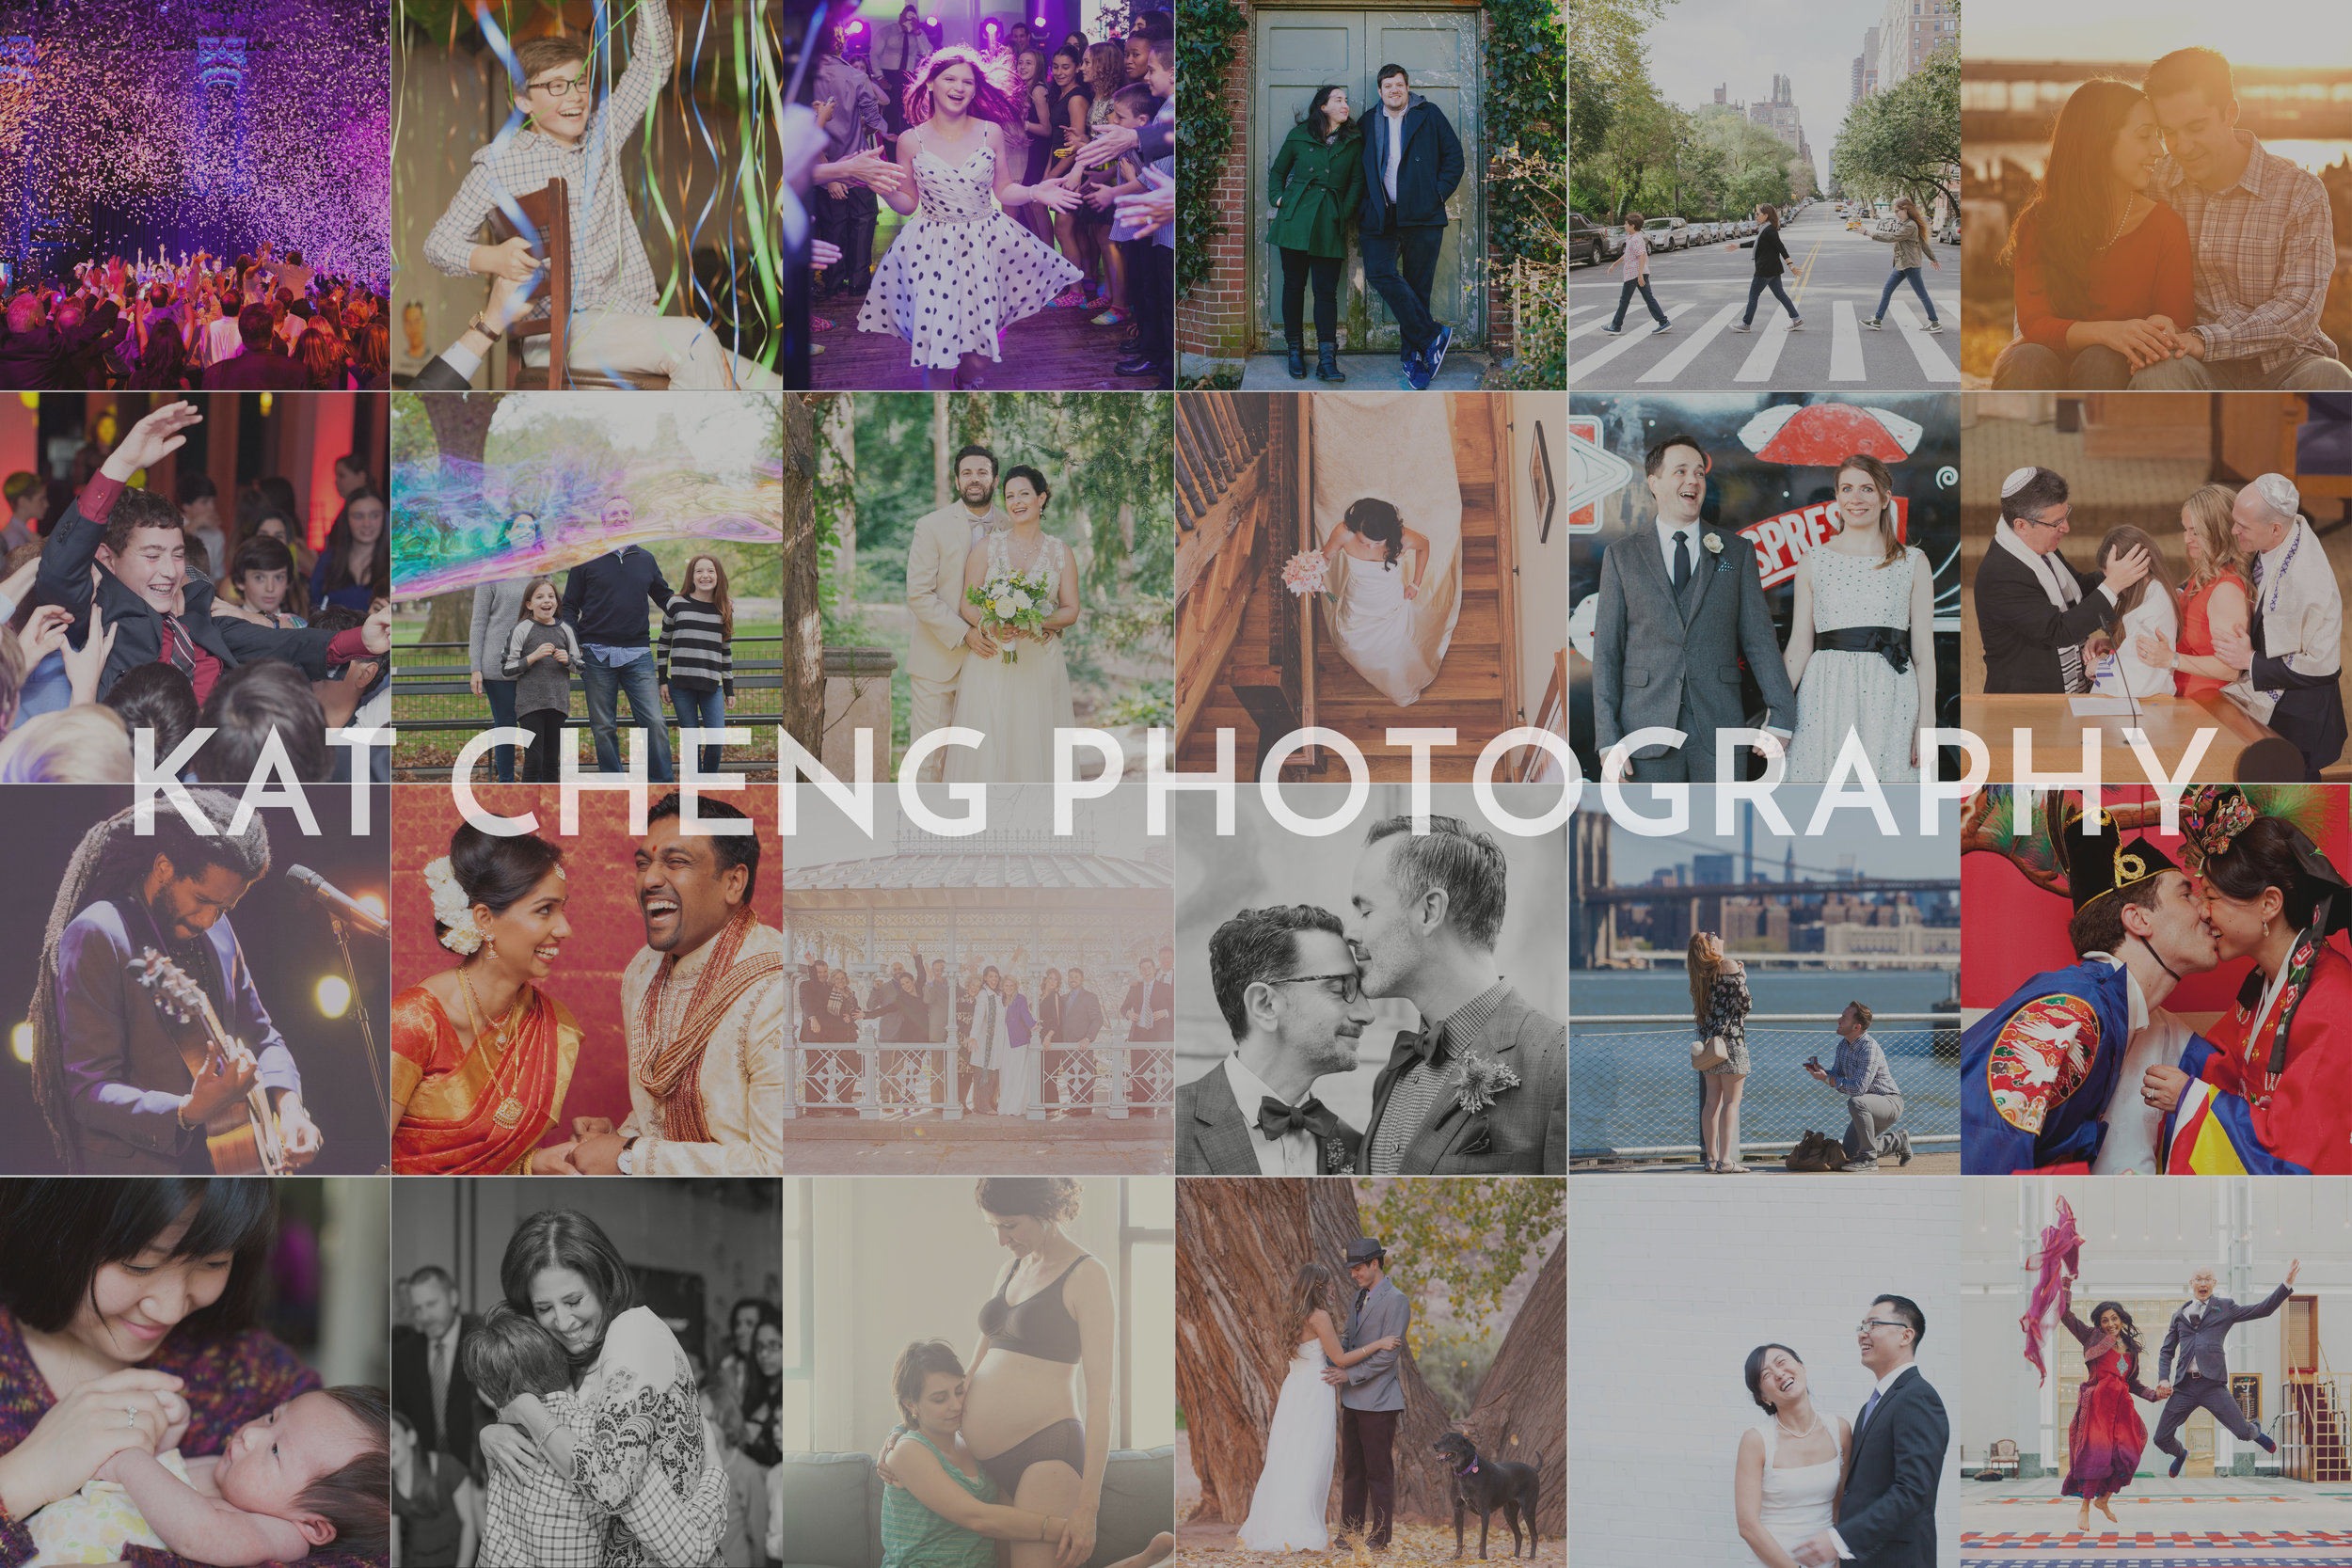 los angeles wedding photography.jpg